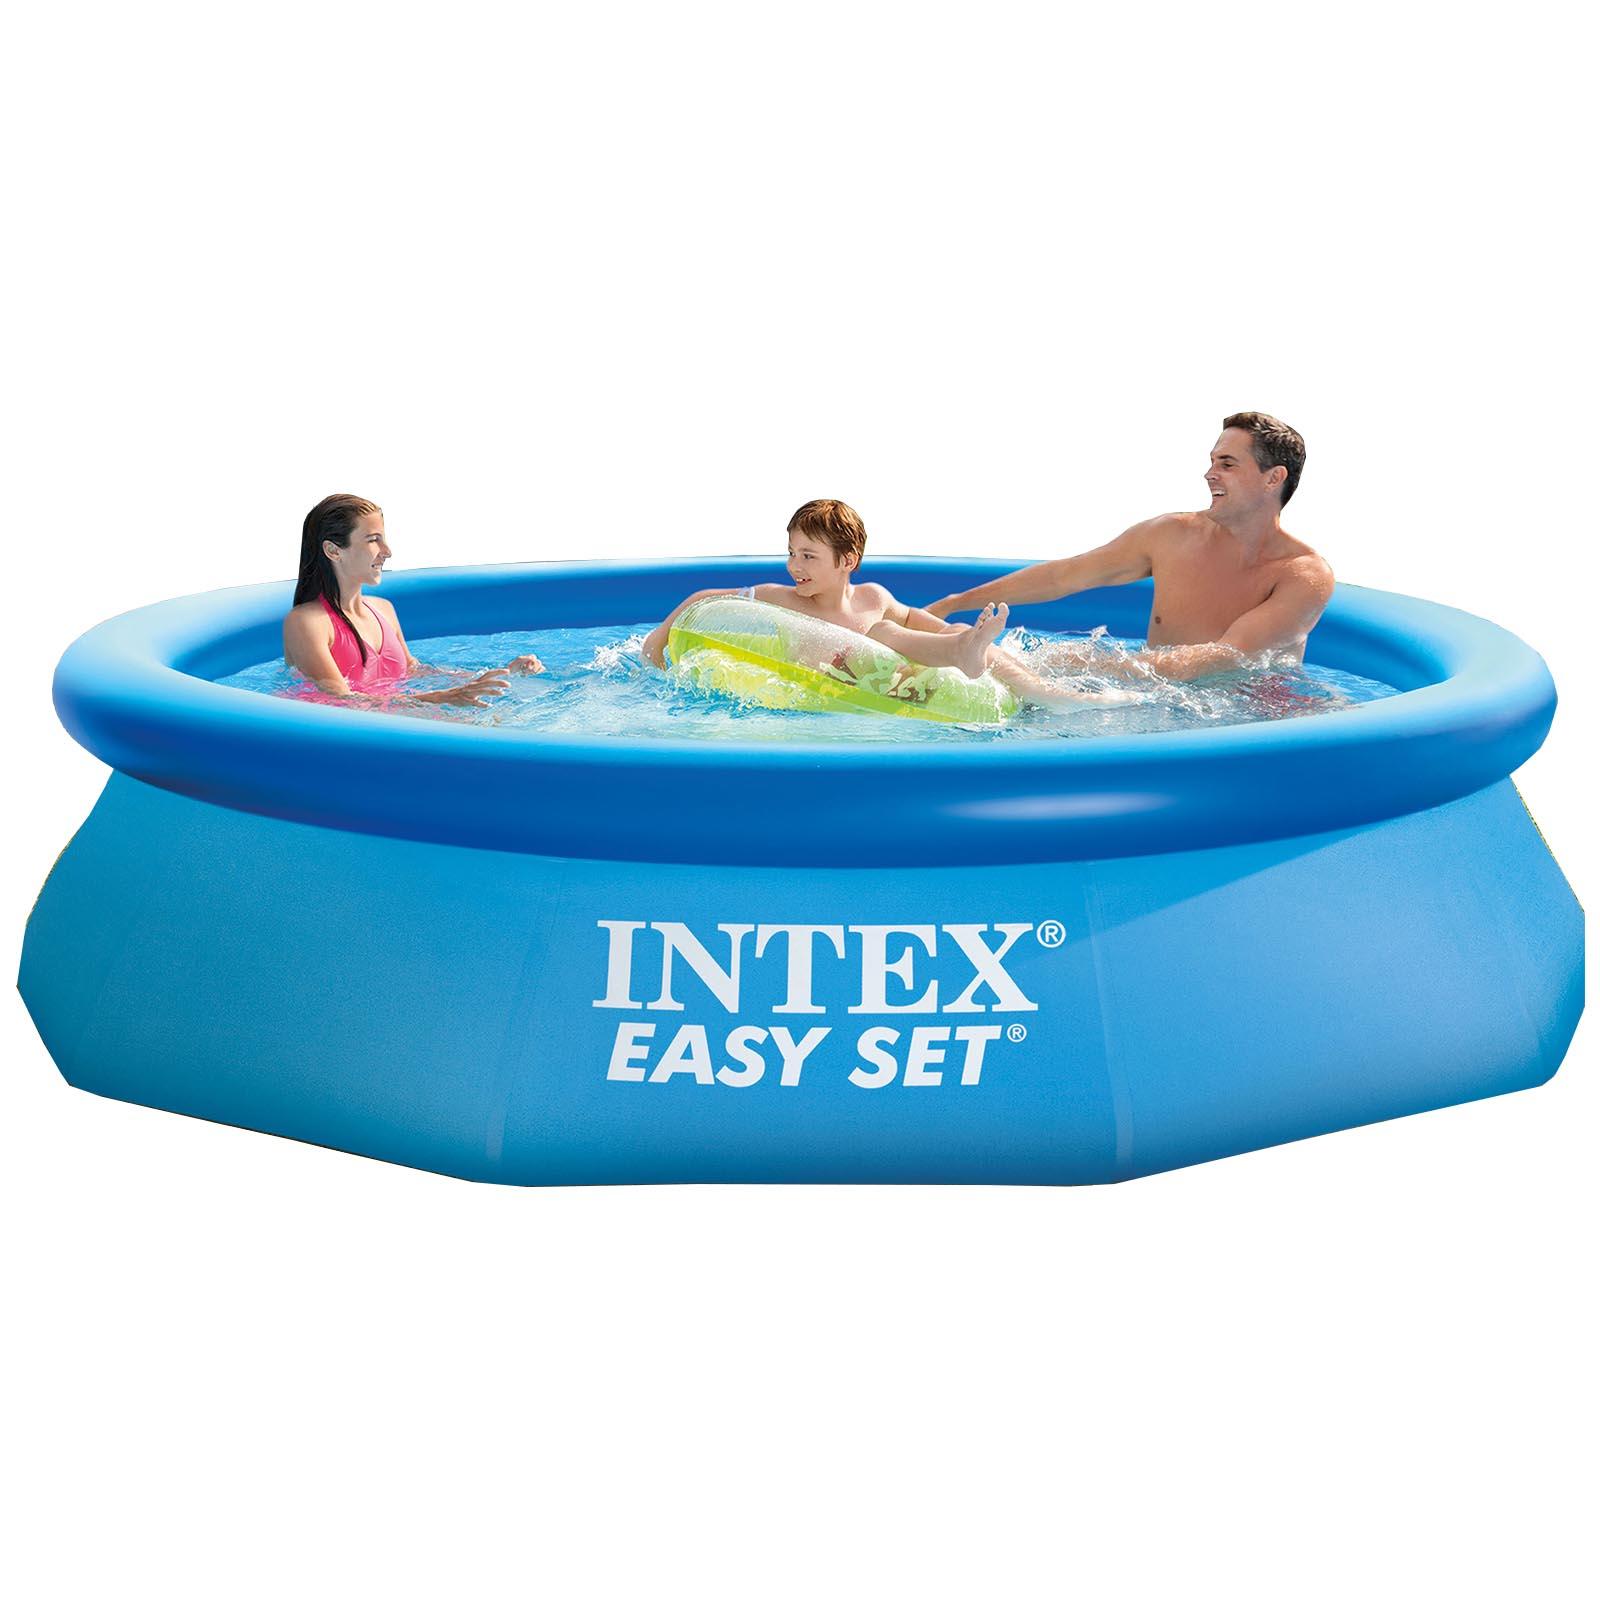 Details about Intex 10\' x 30\